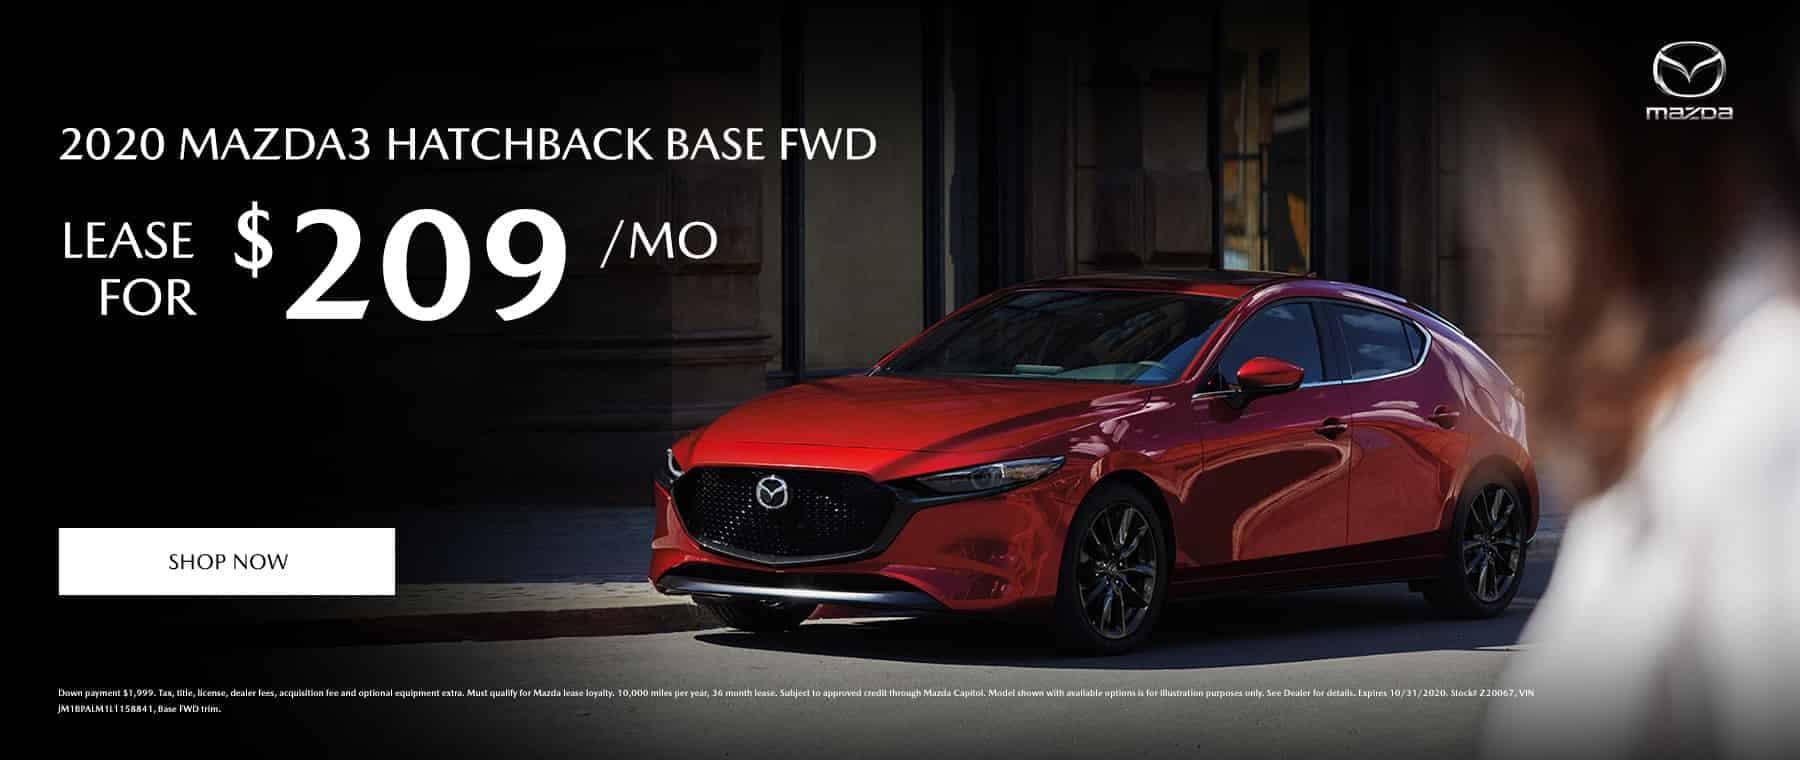 Lease a 2020 Mazda 3 Hatchback Base FWD for $209 per month